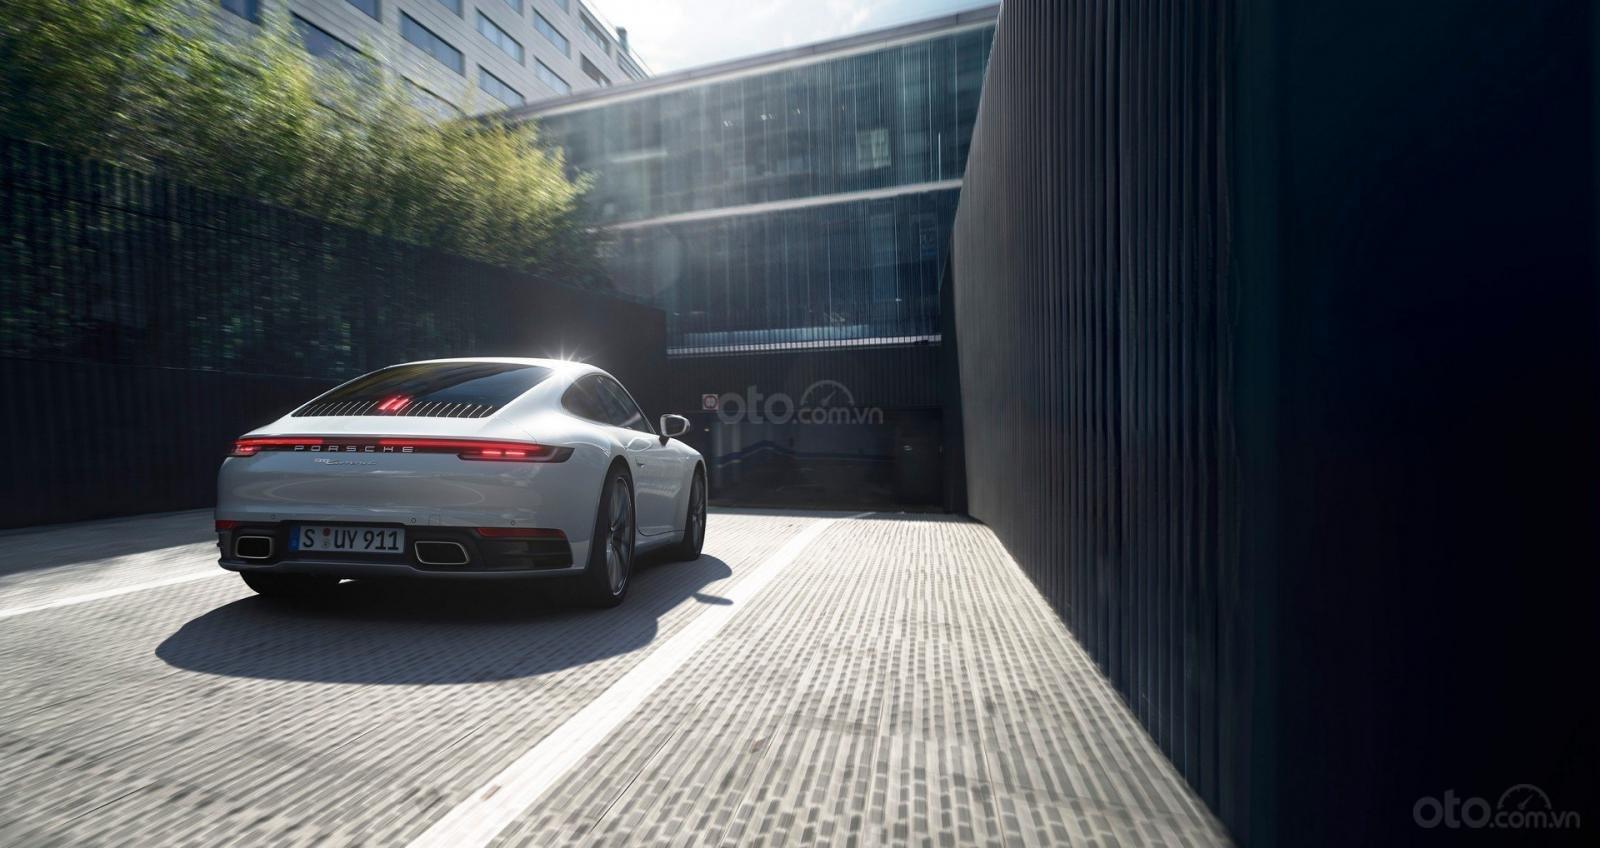 Chiêm ngưỡng Porsche 911 Carrera và 911 Carrera 4 Cabriolet 2020.